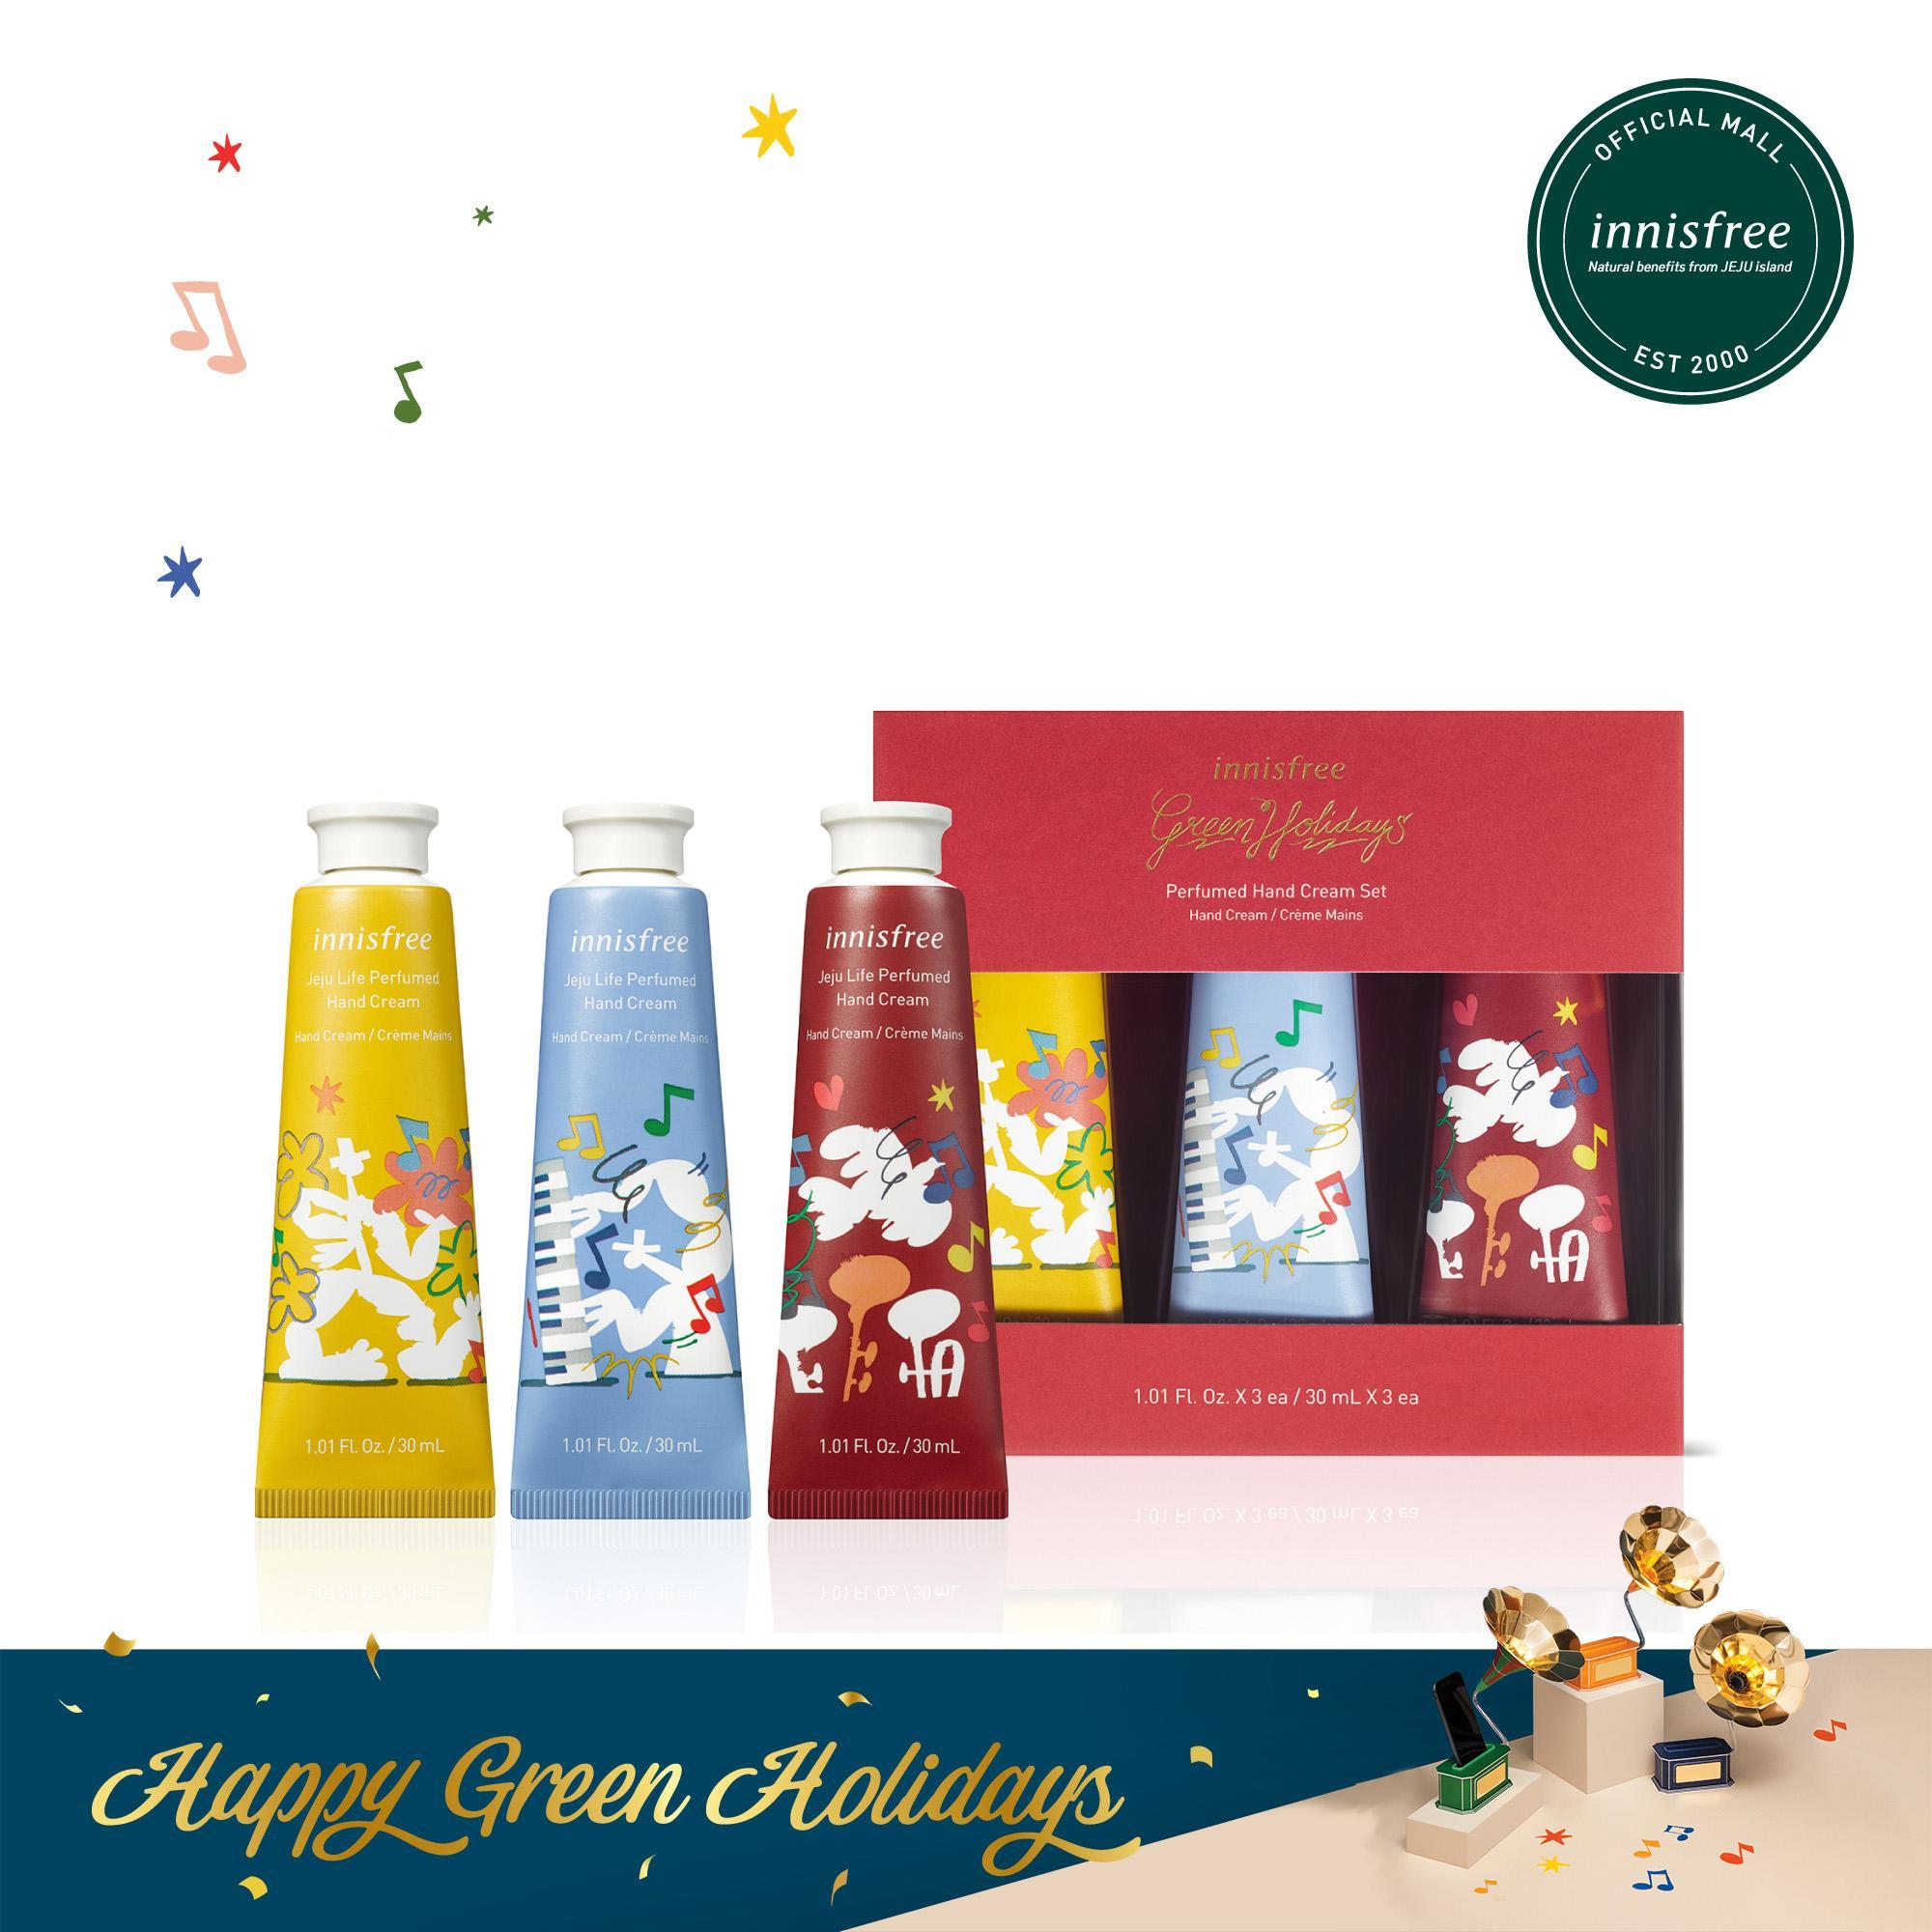 [Phiên bản Green Holidays] Bộ 3 kem dưỡng da tay innisfree Perfumed Hand Cream Set